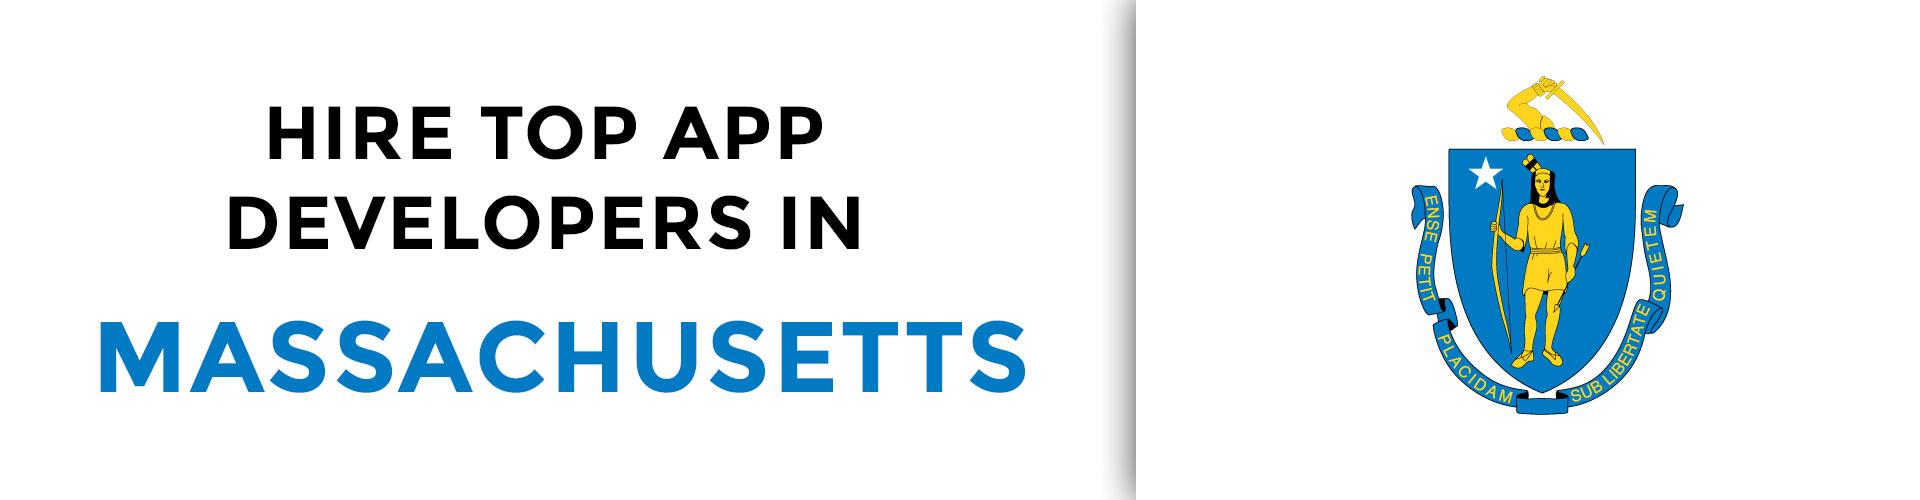 mobile app development company massachusetts